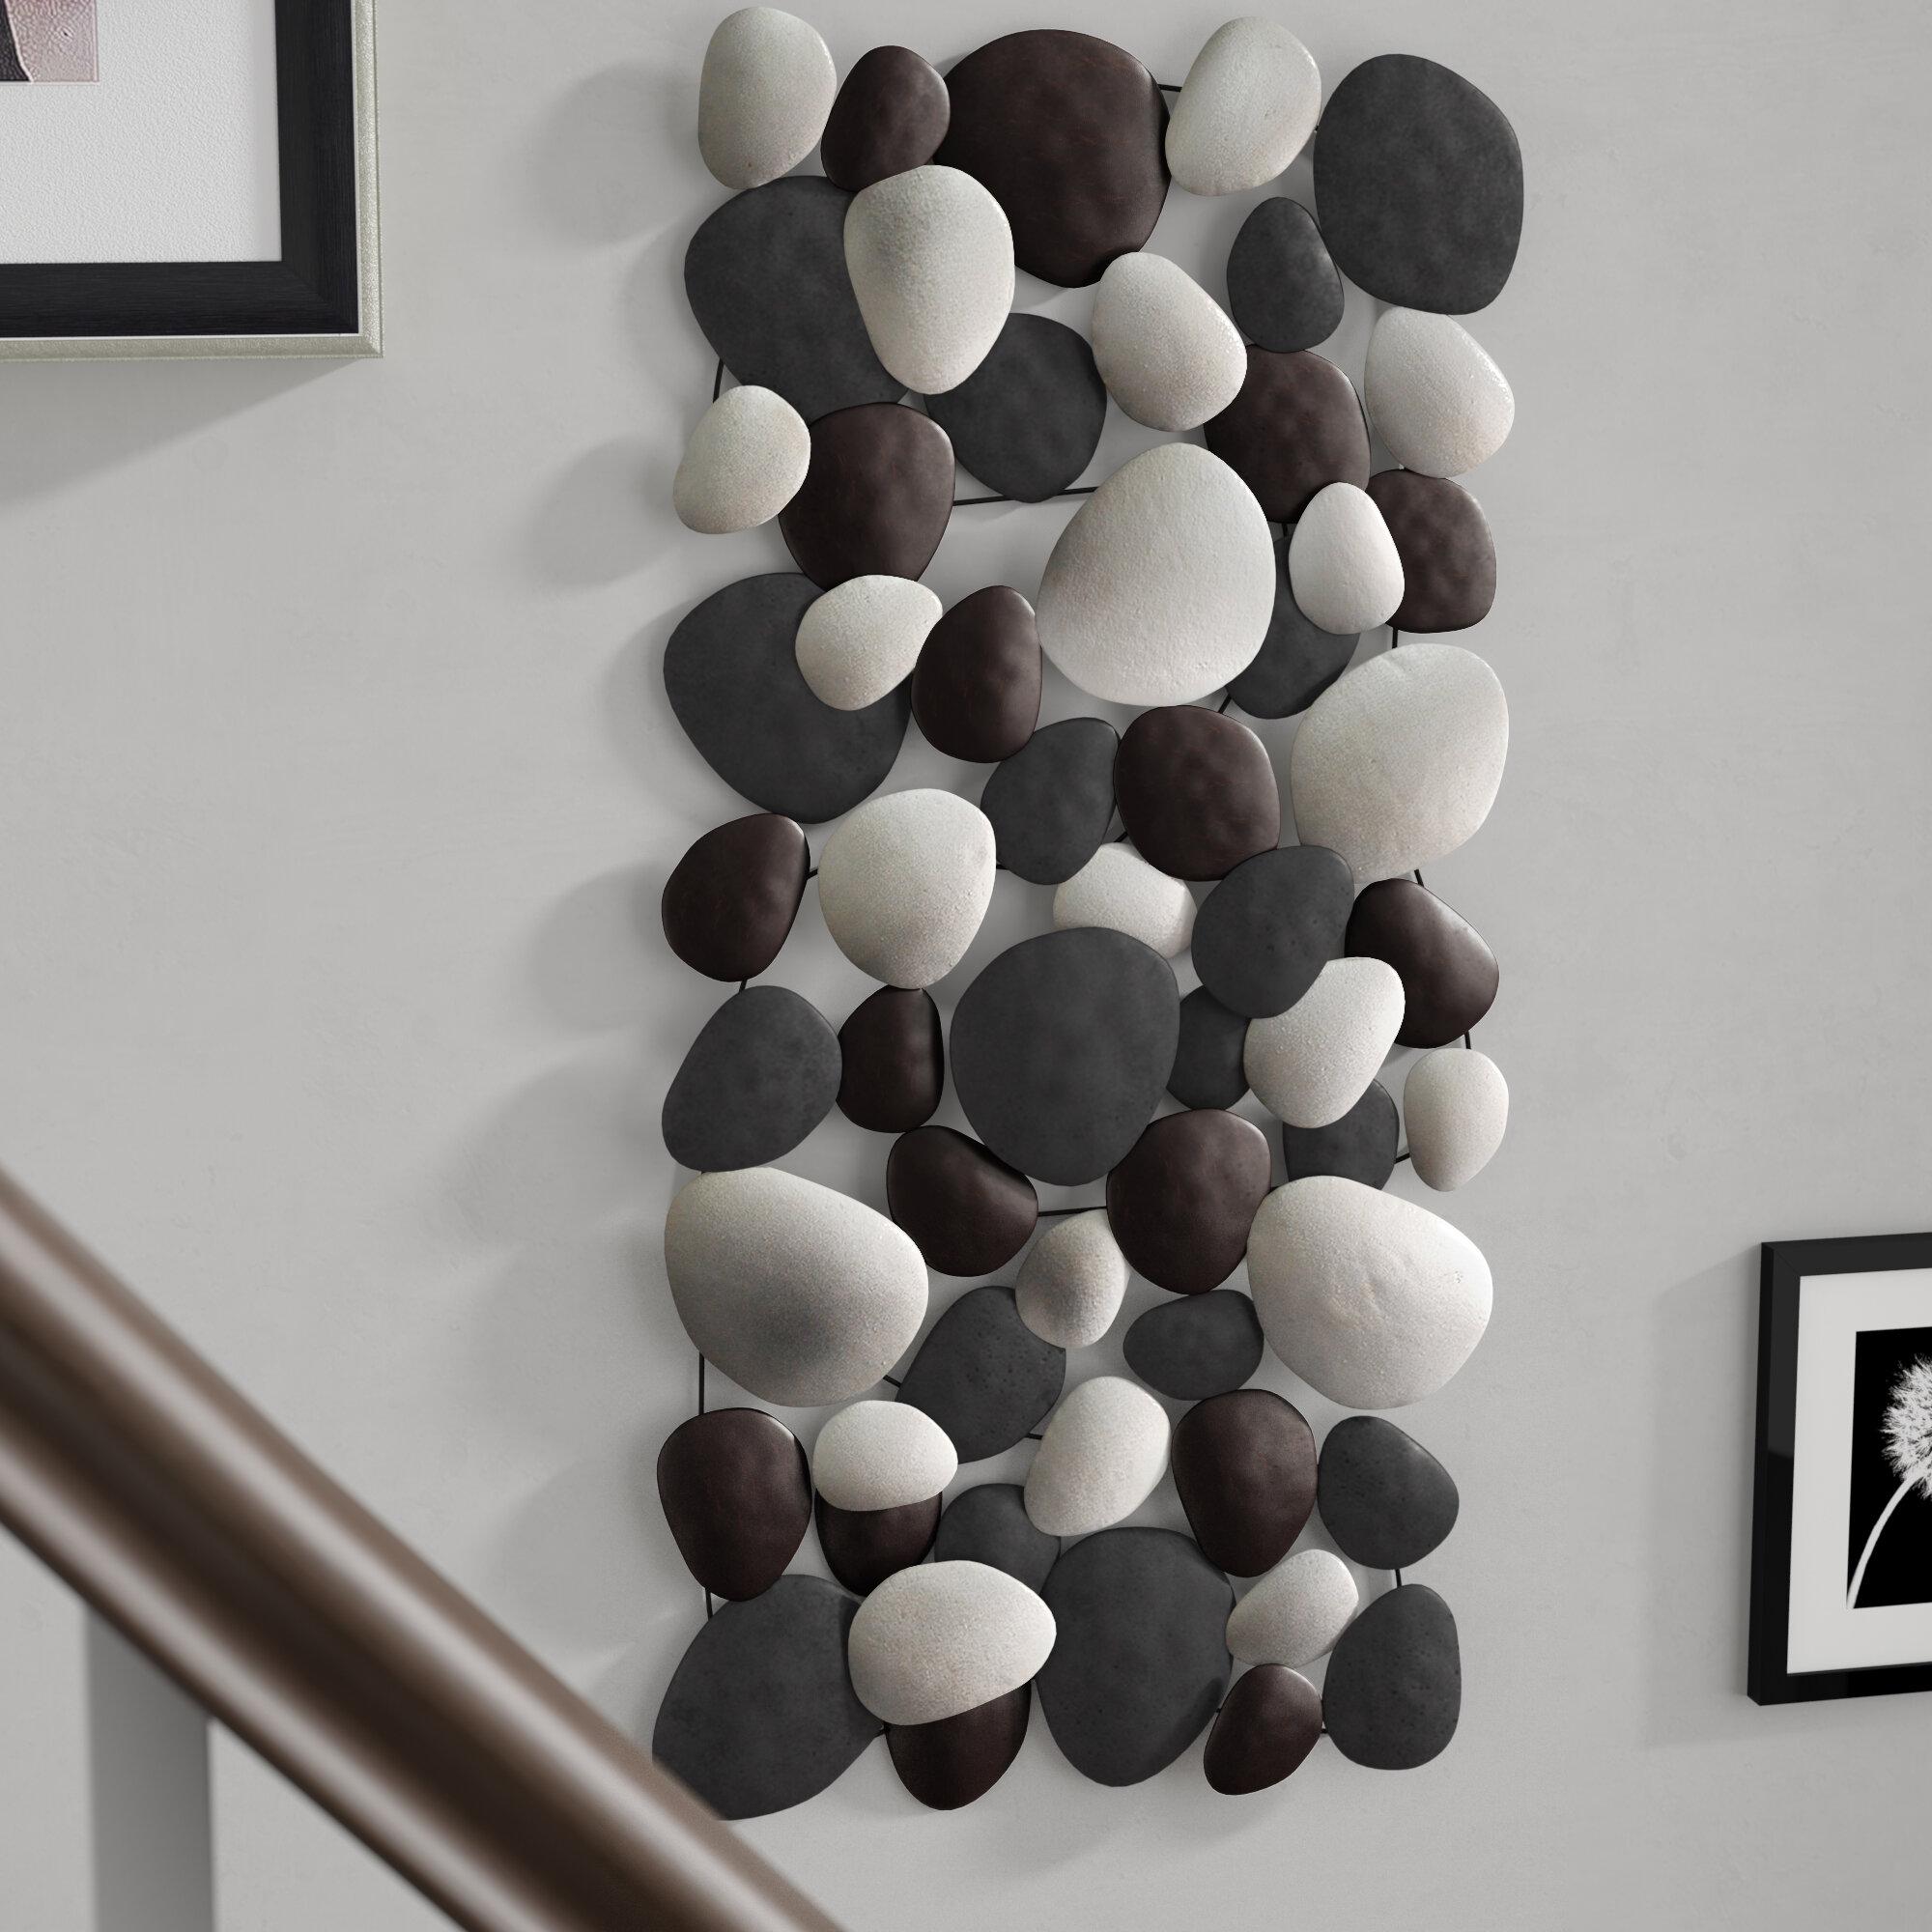 Alaska Home Steel Cutout Decorative Metal Wall Sculpture Art Hanging Decor